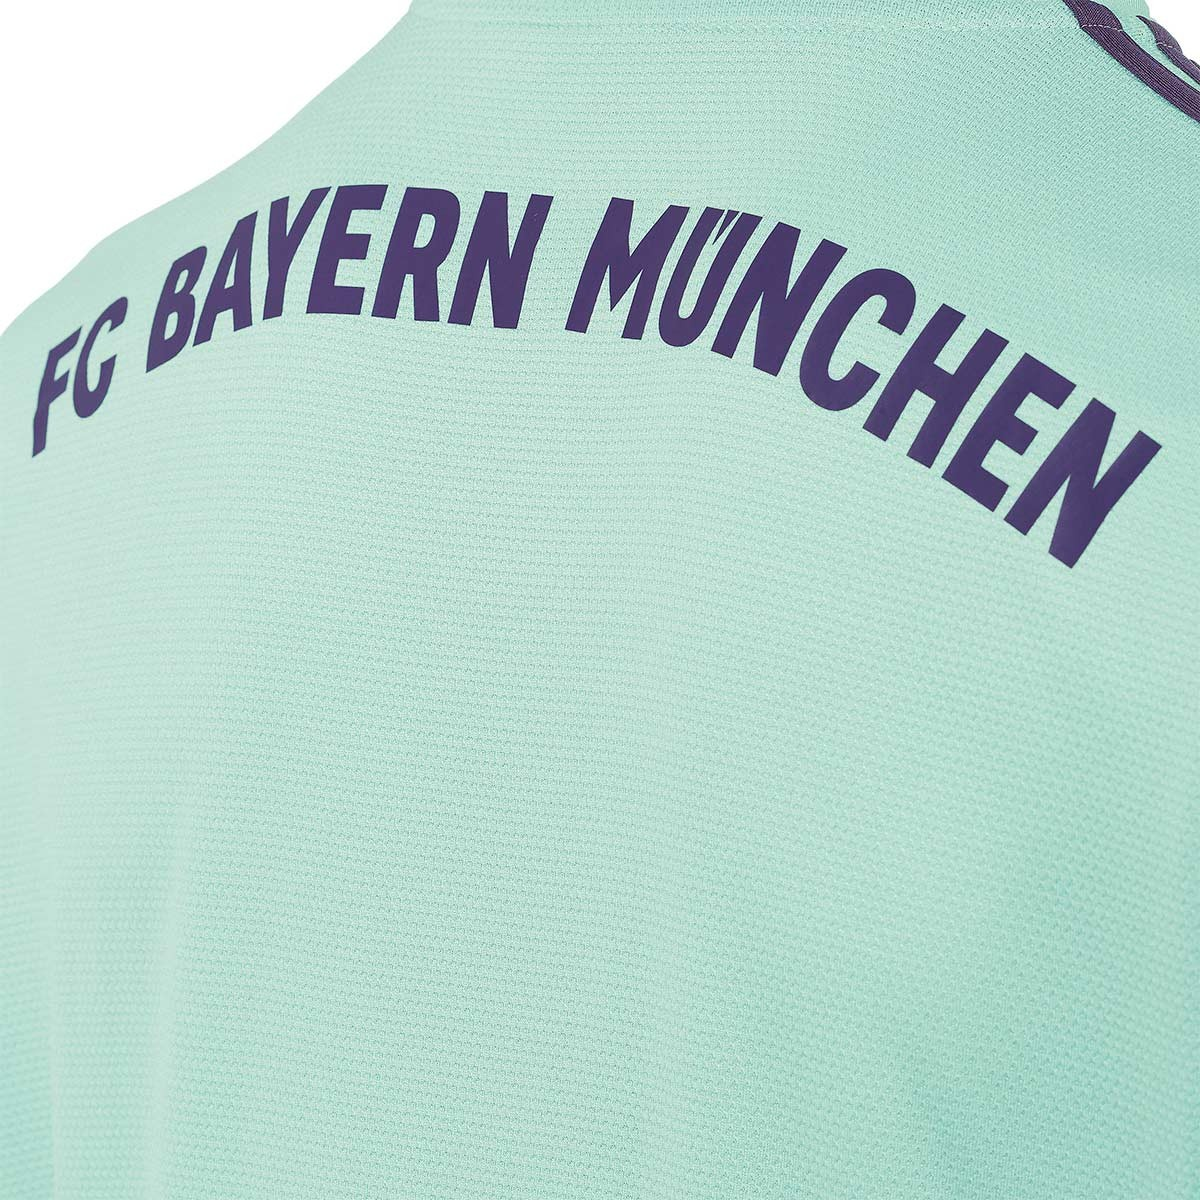 segunda equipacion FC Bayern München modelos